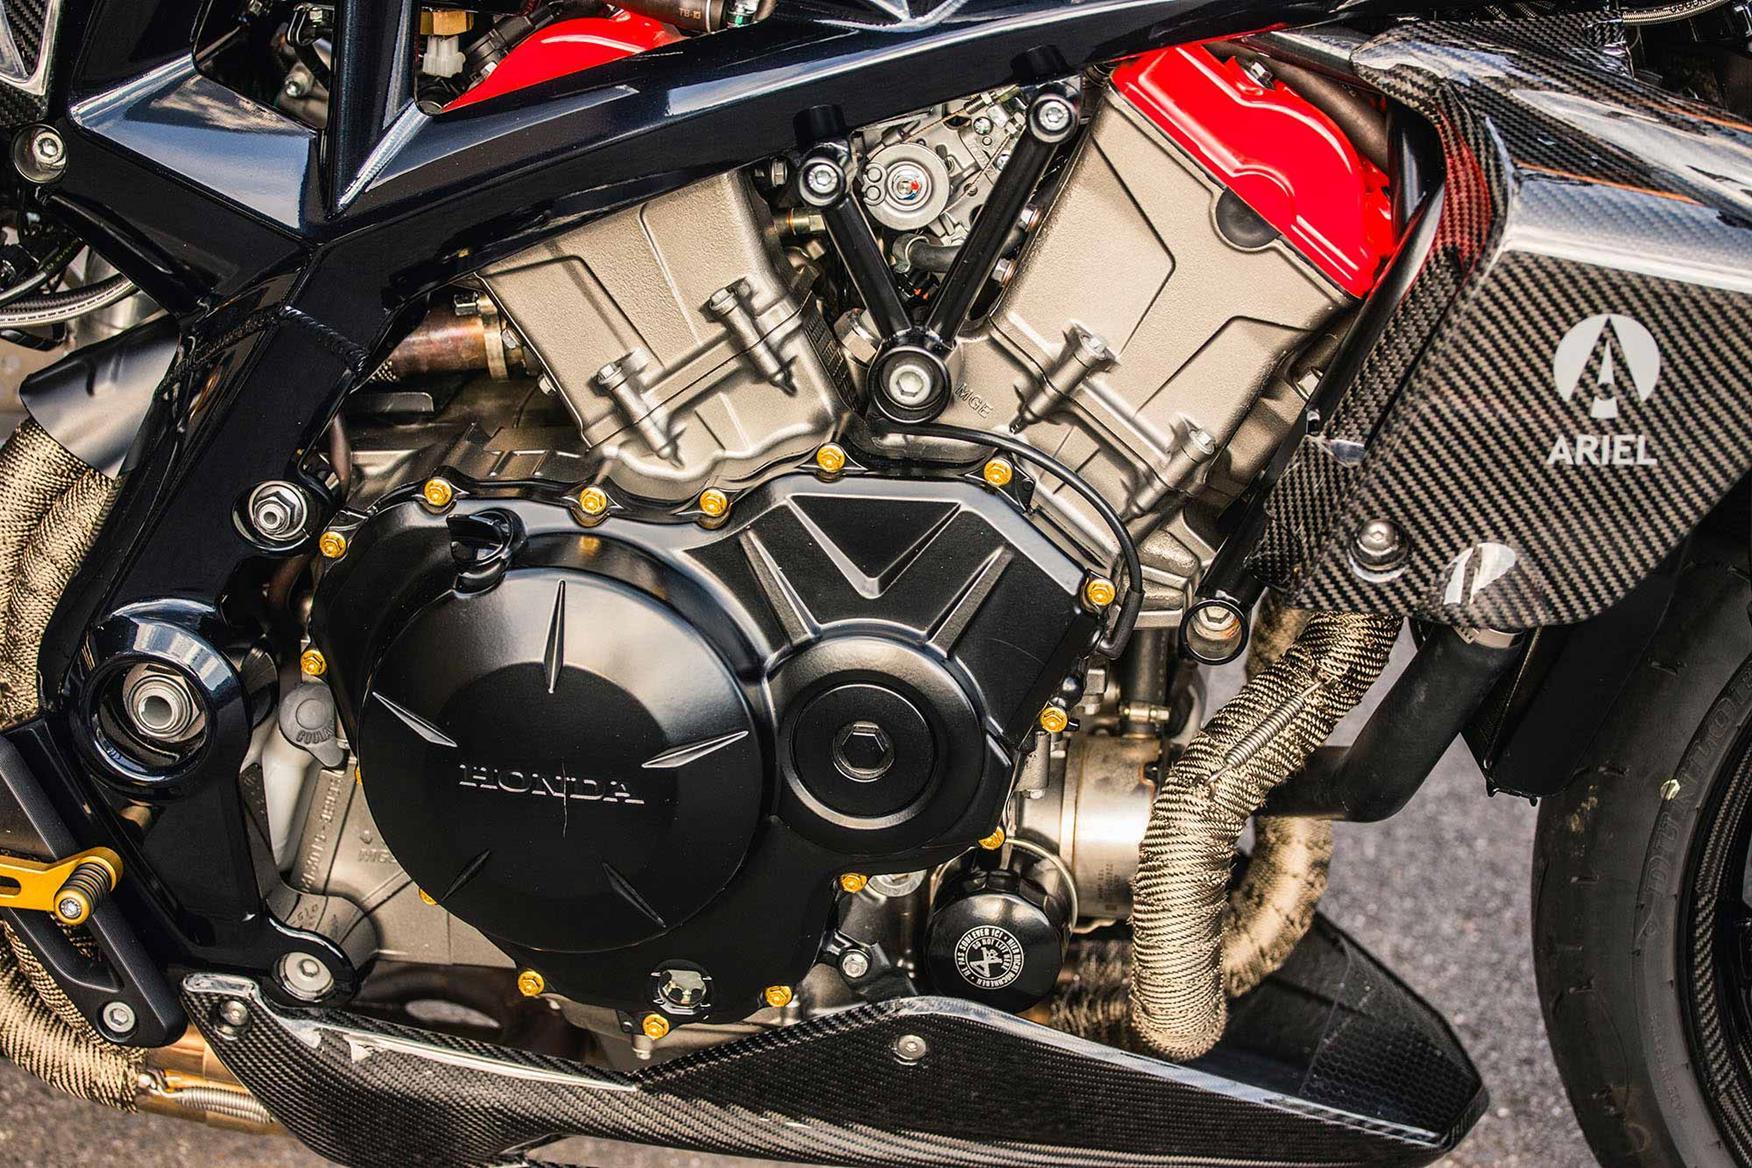 The Ariel Ace R V4 engine